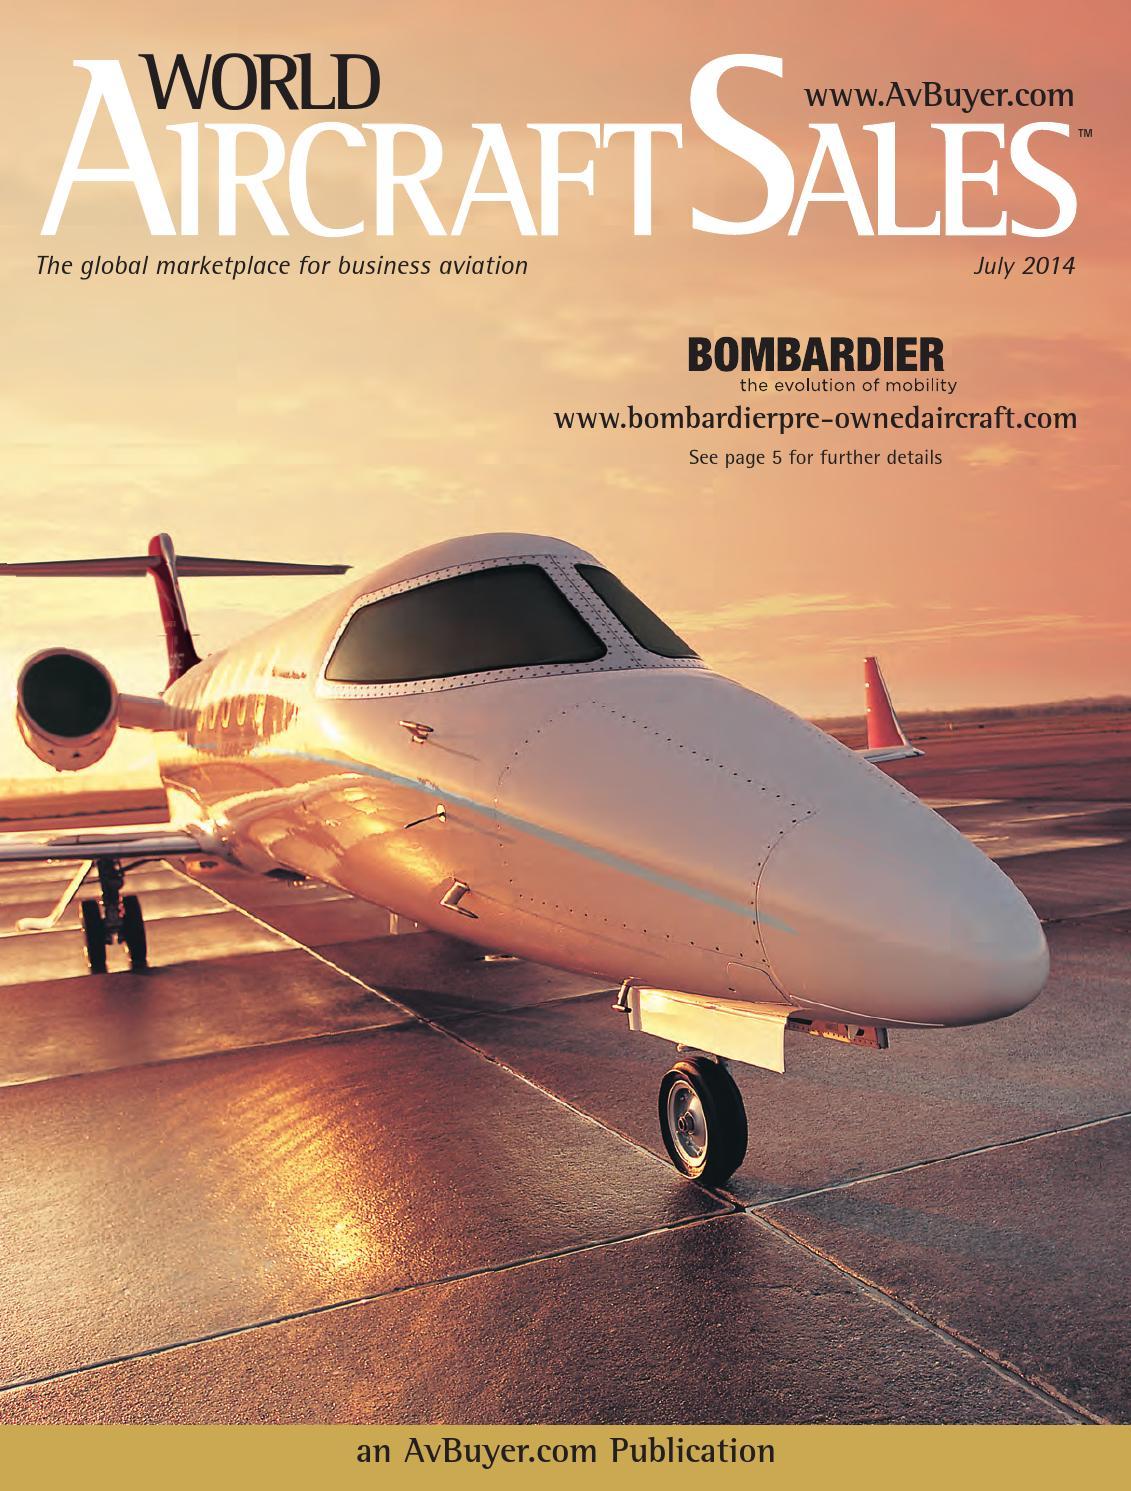 World Aircraft Sales Magazine July 2014 by AvBuyer Ltd  - issuu